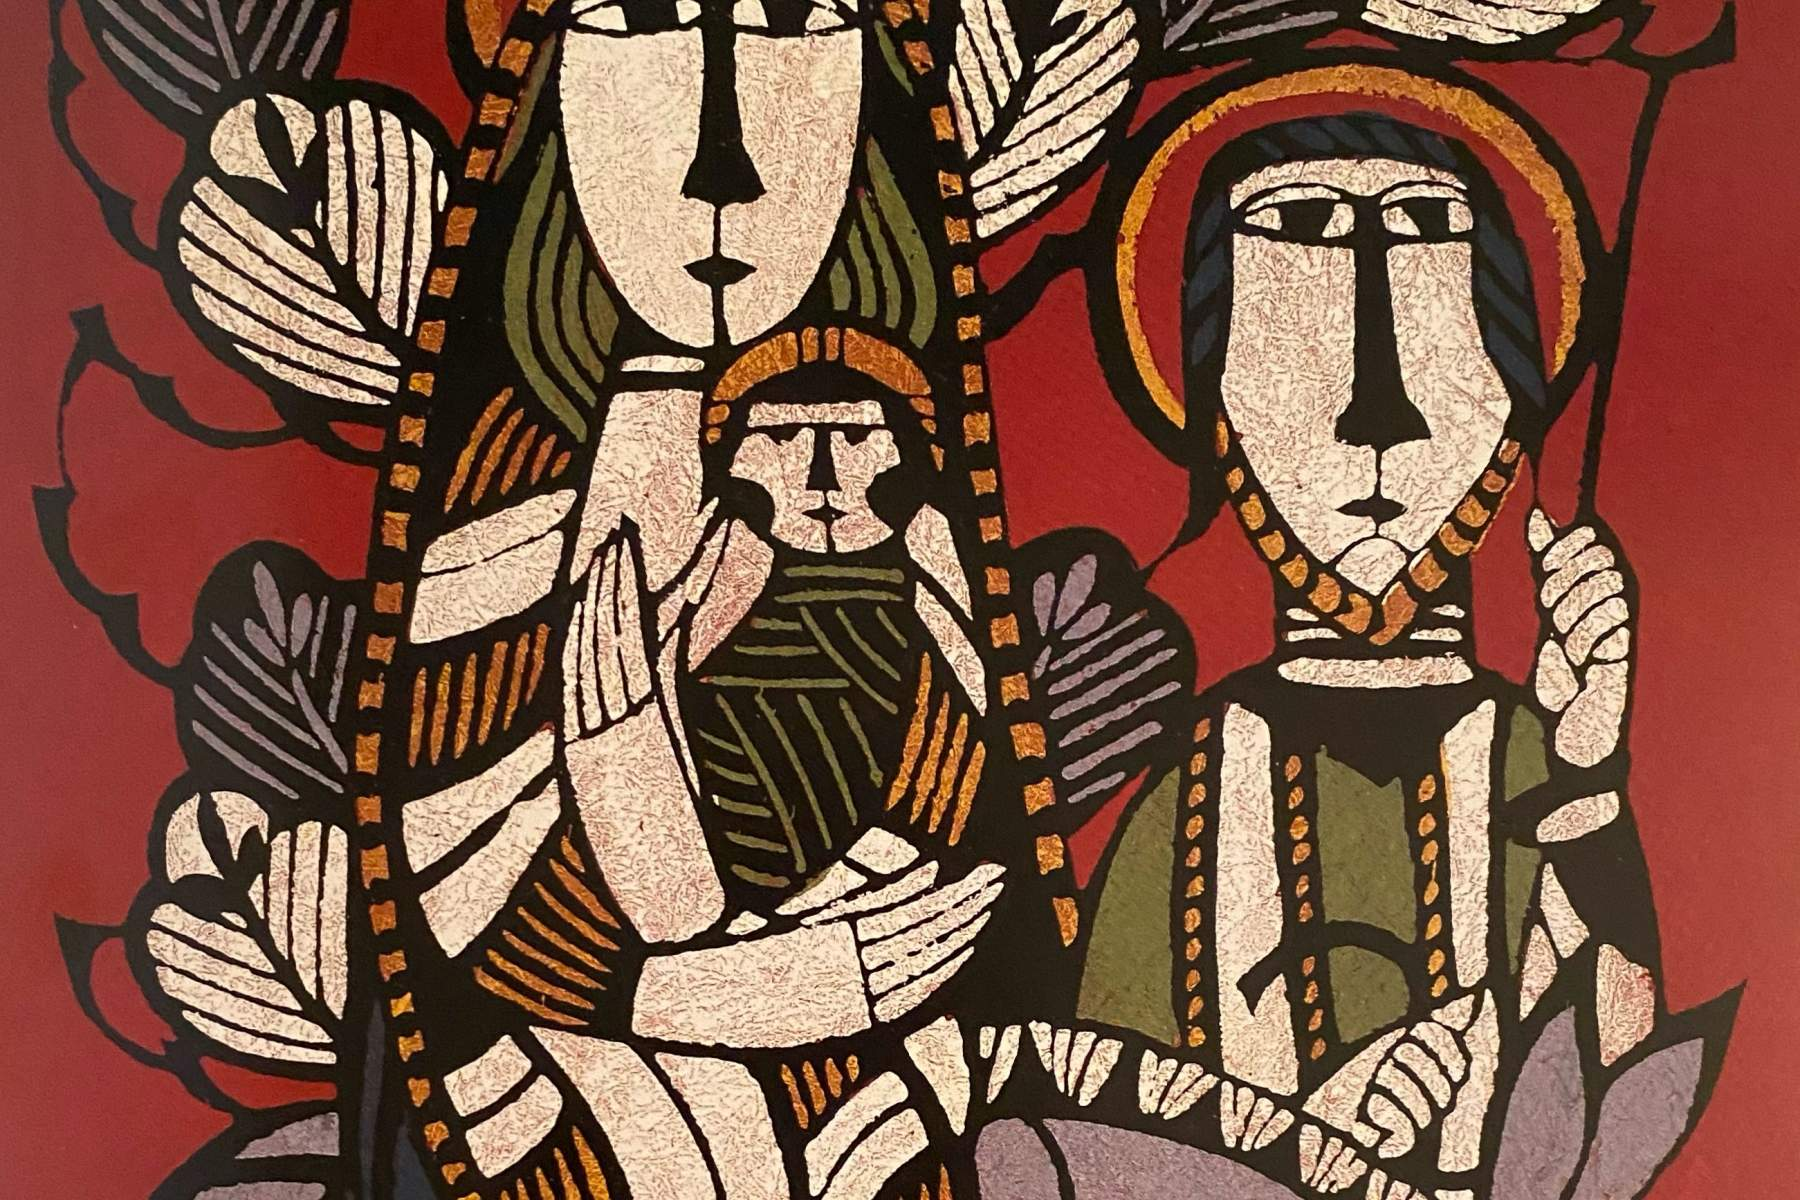 Bishop Tor B. Jørgensen's Advent Message: A Living Hope in Uncertain Times